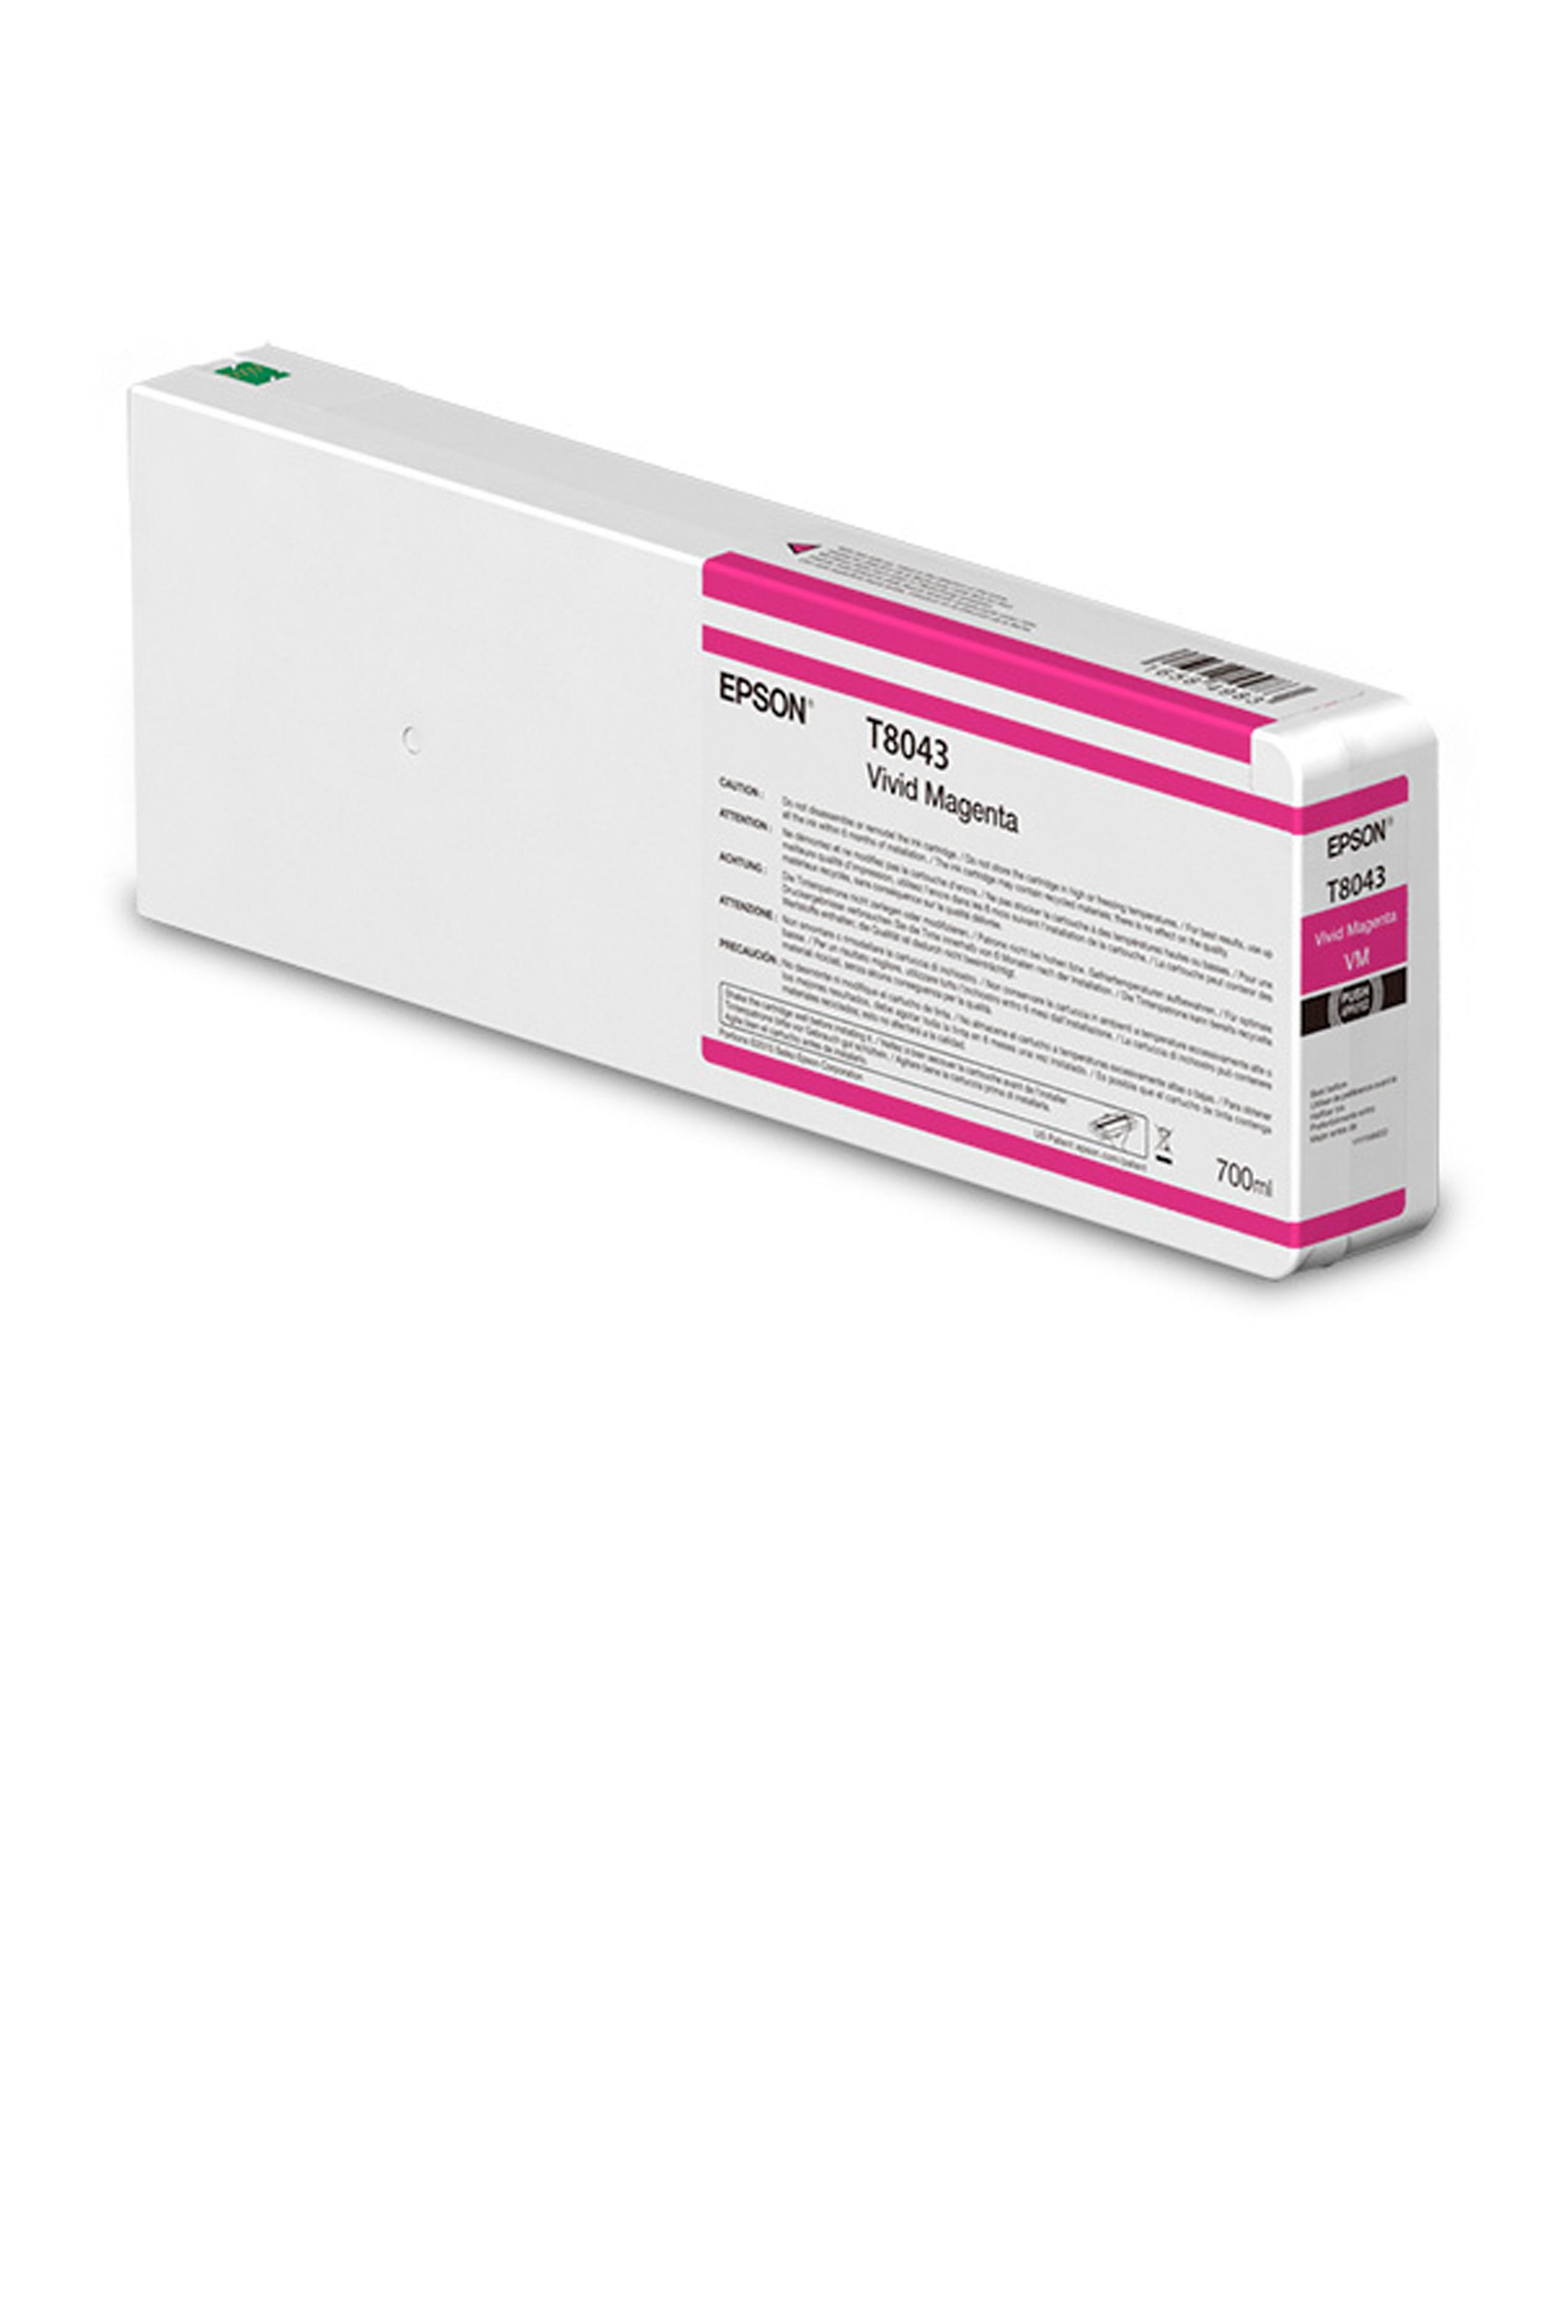 Epson EPSON XH MAGENTA INK (700 ML) (T804300)